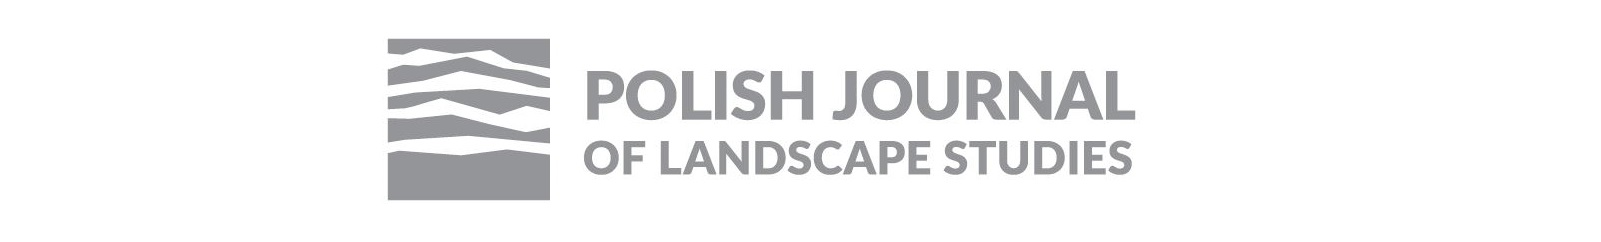 Polish Journal of Landscape Studies